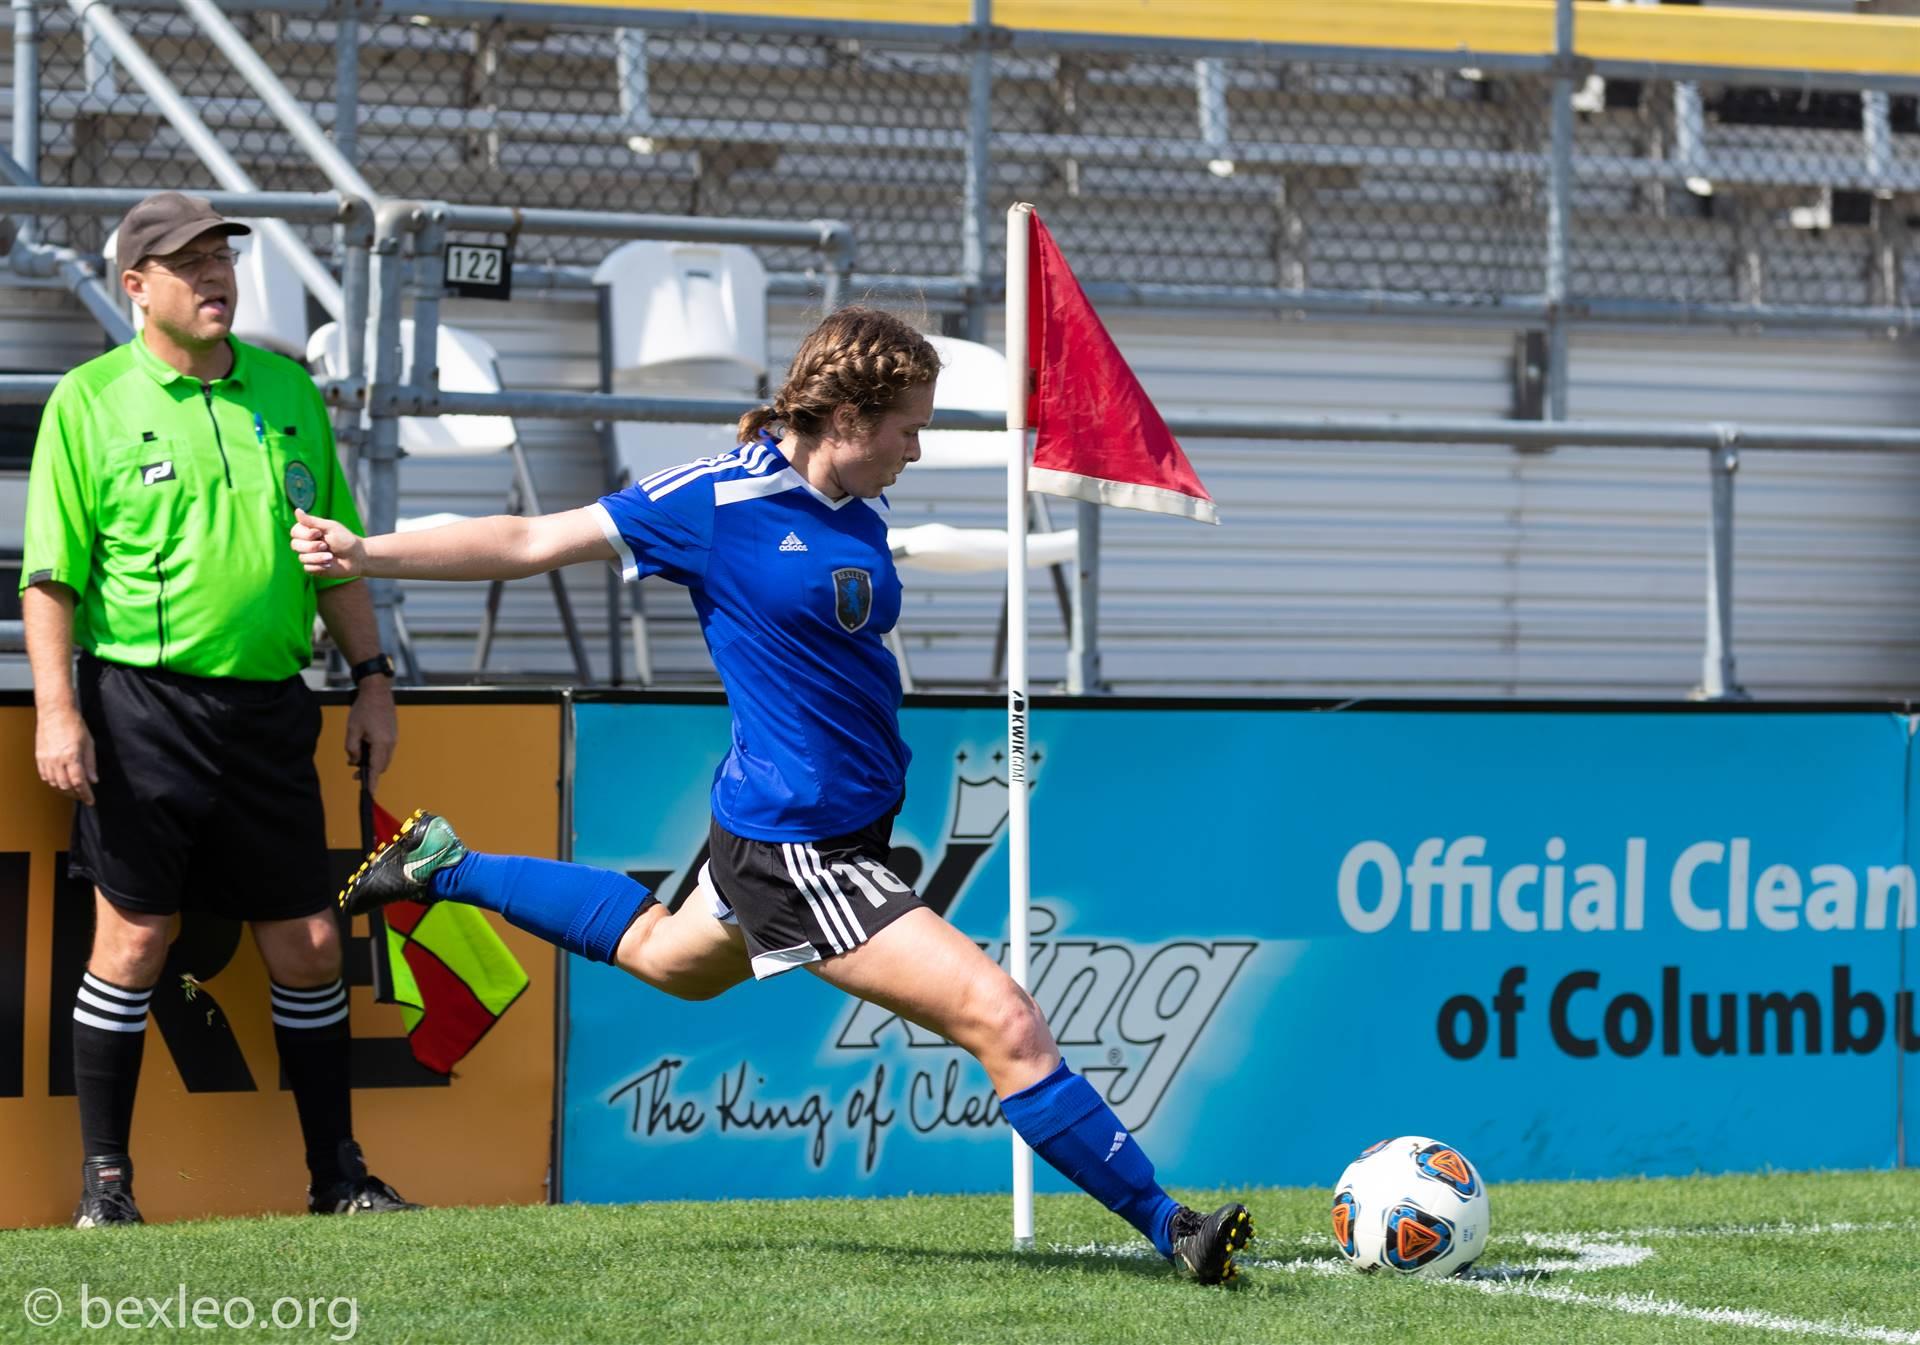 Girls Soccer Player executes a corner kick @ Crew Stadium